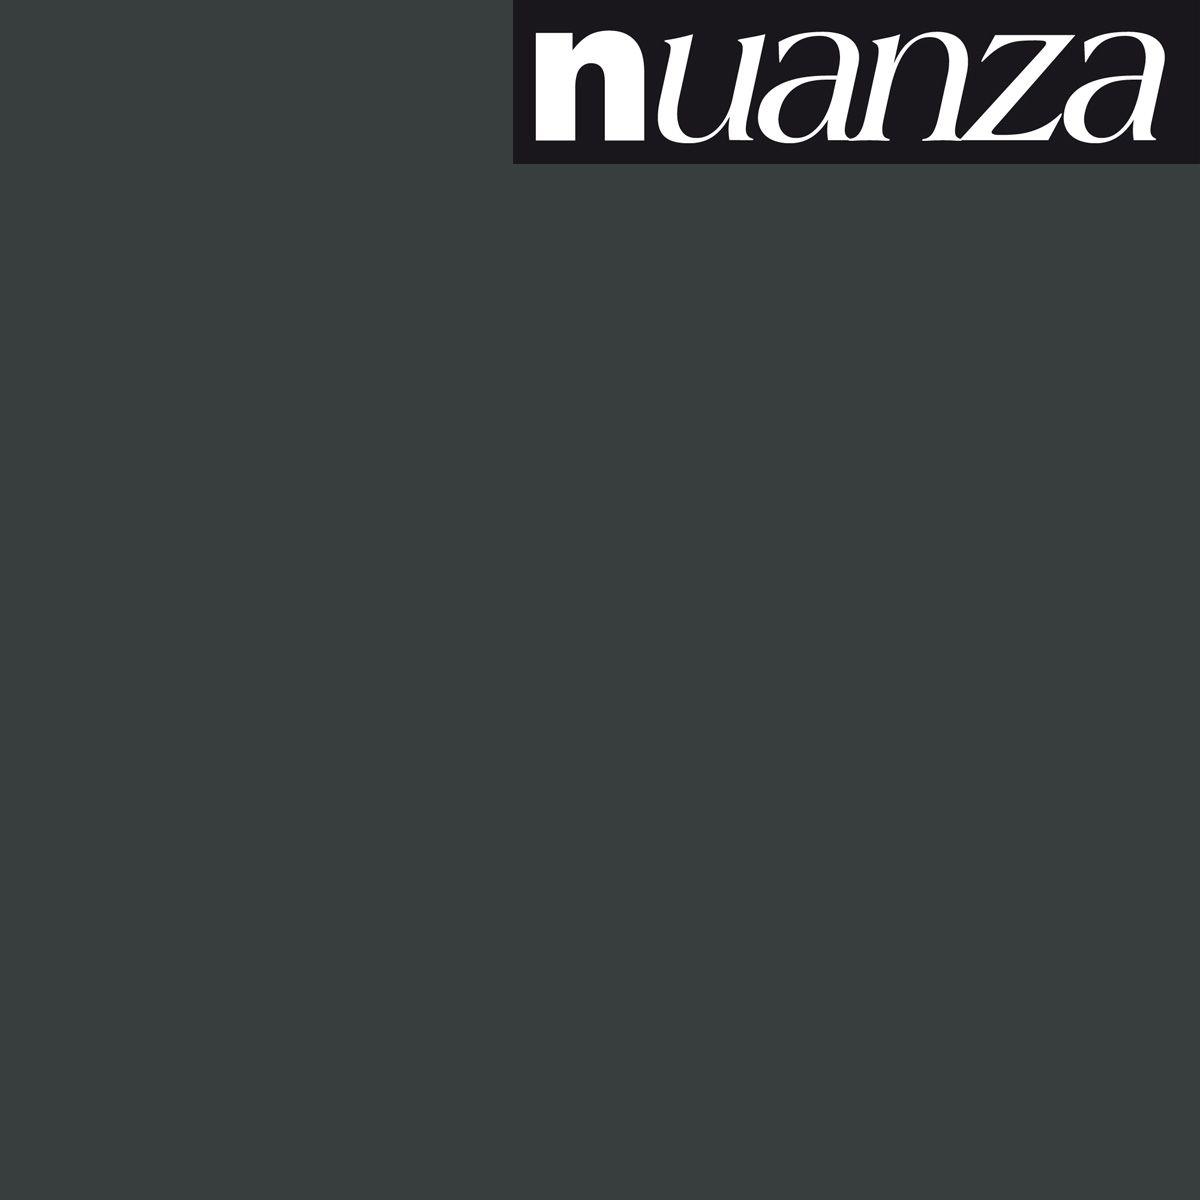 Peinture noir satin multisupports Nuanza 0.5l